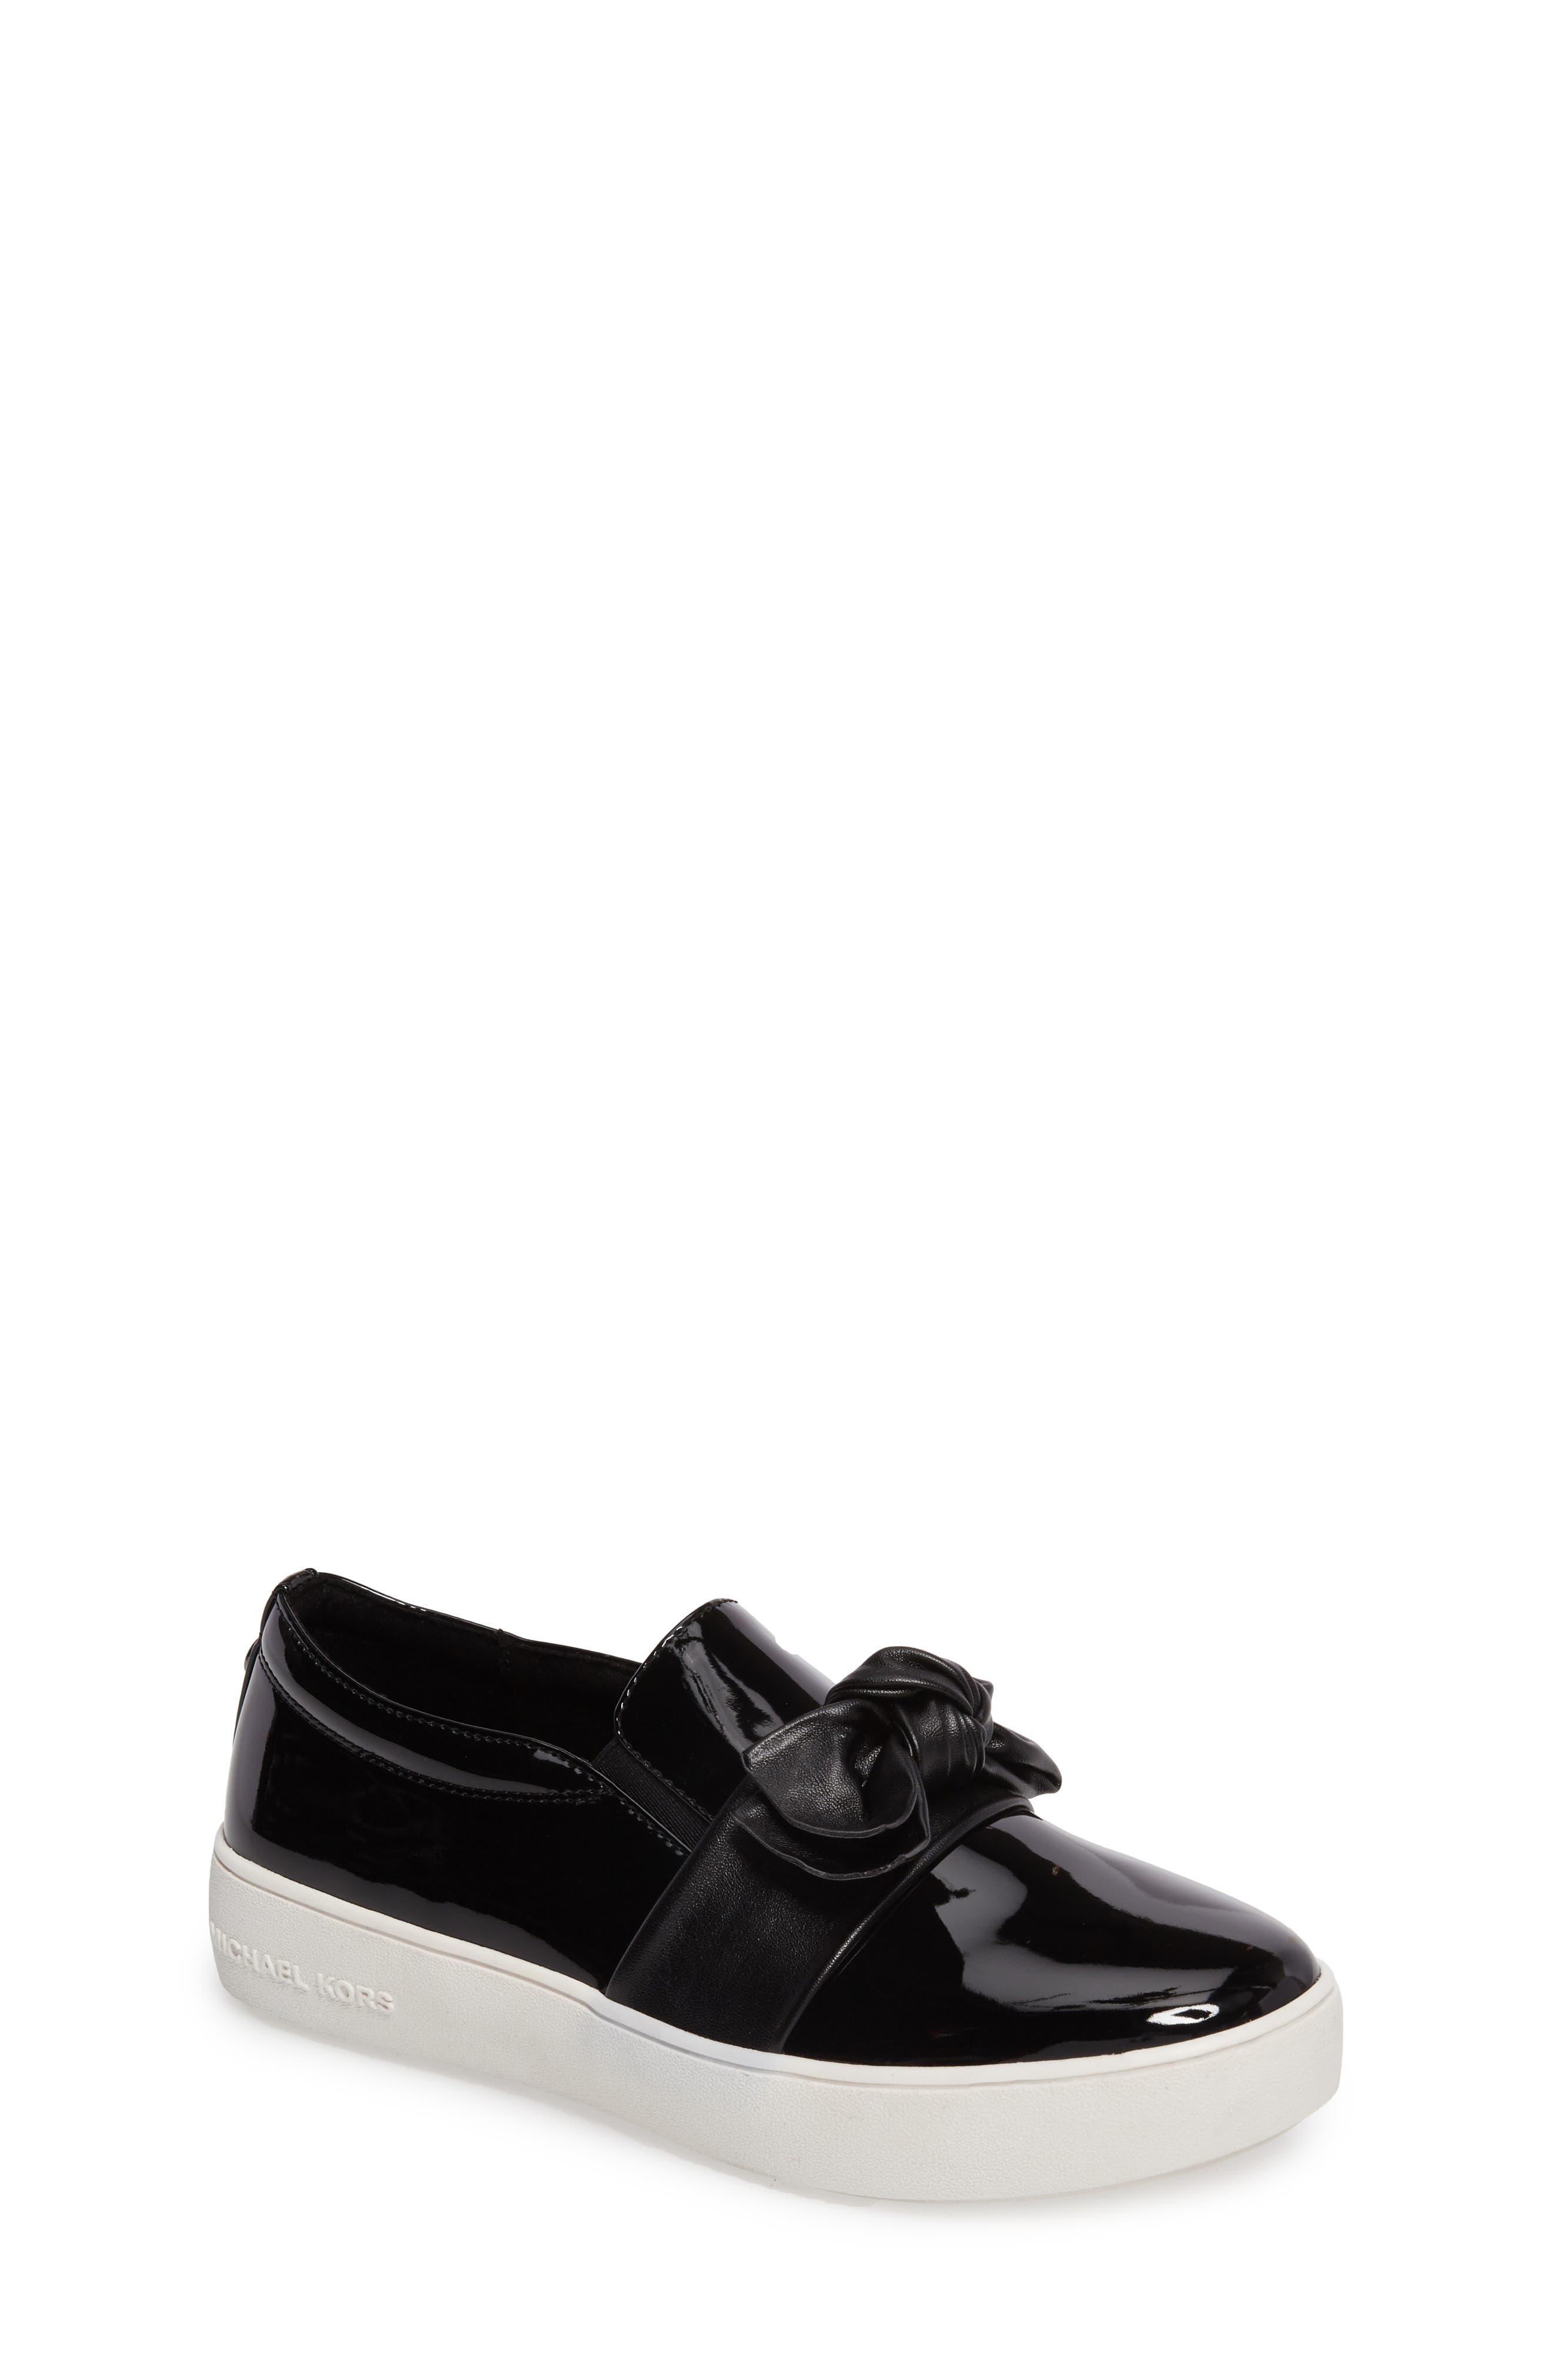 Maven Poppy Knotted Slip-On Sneaker,                         Main,                         color,